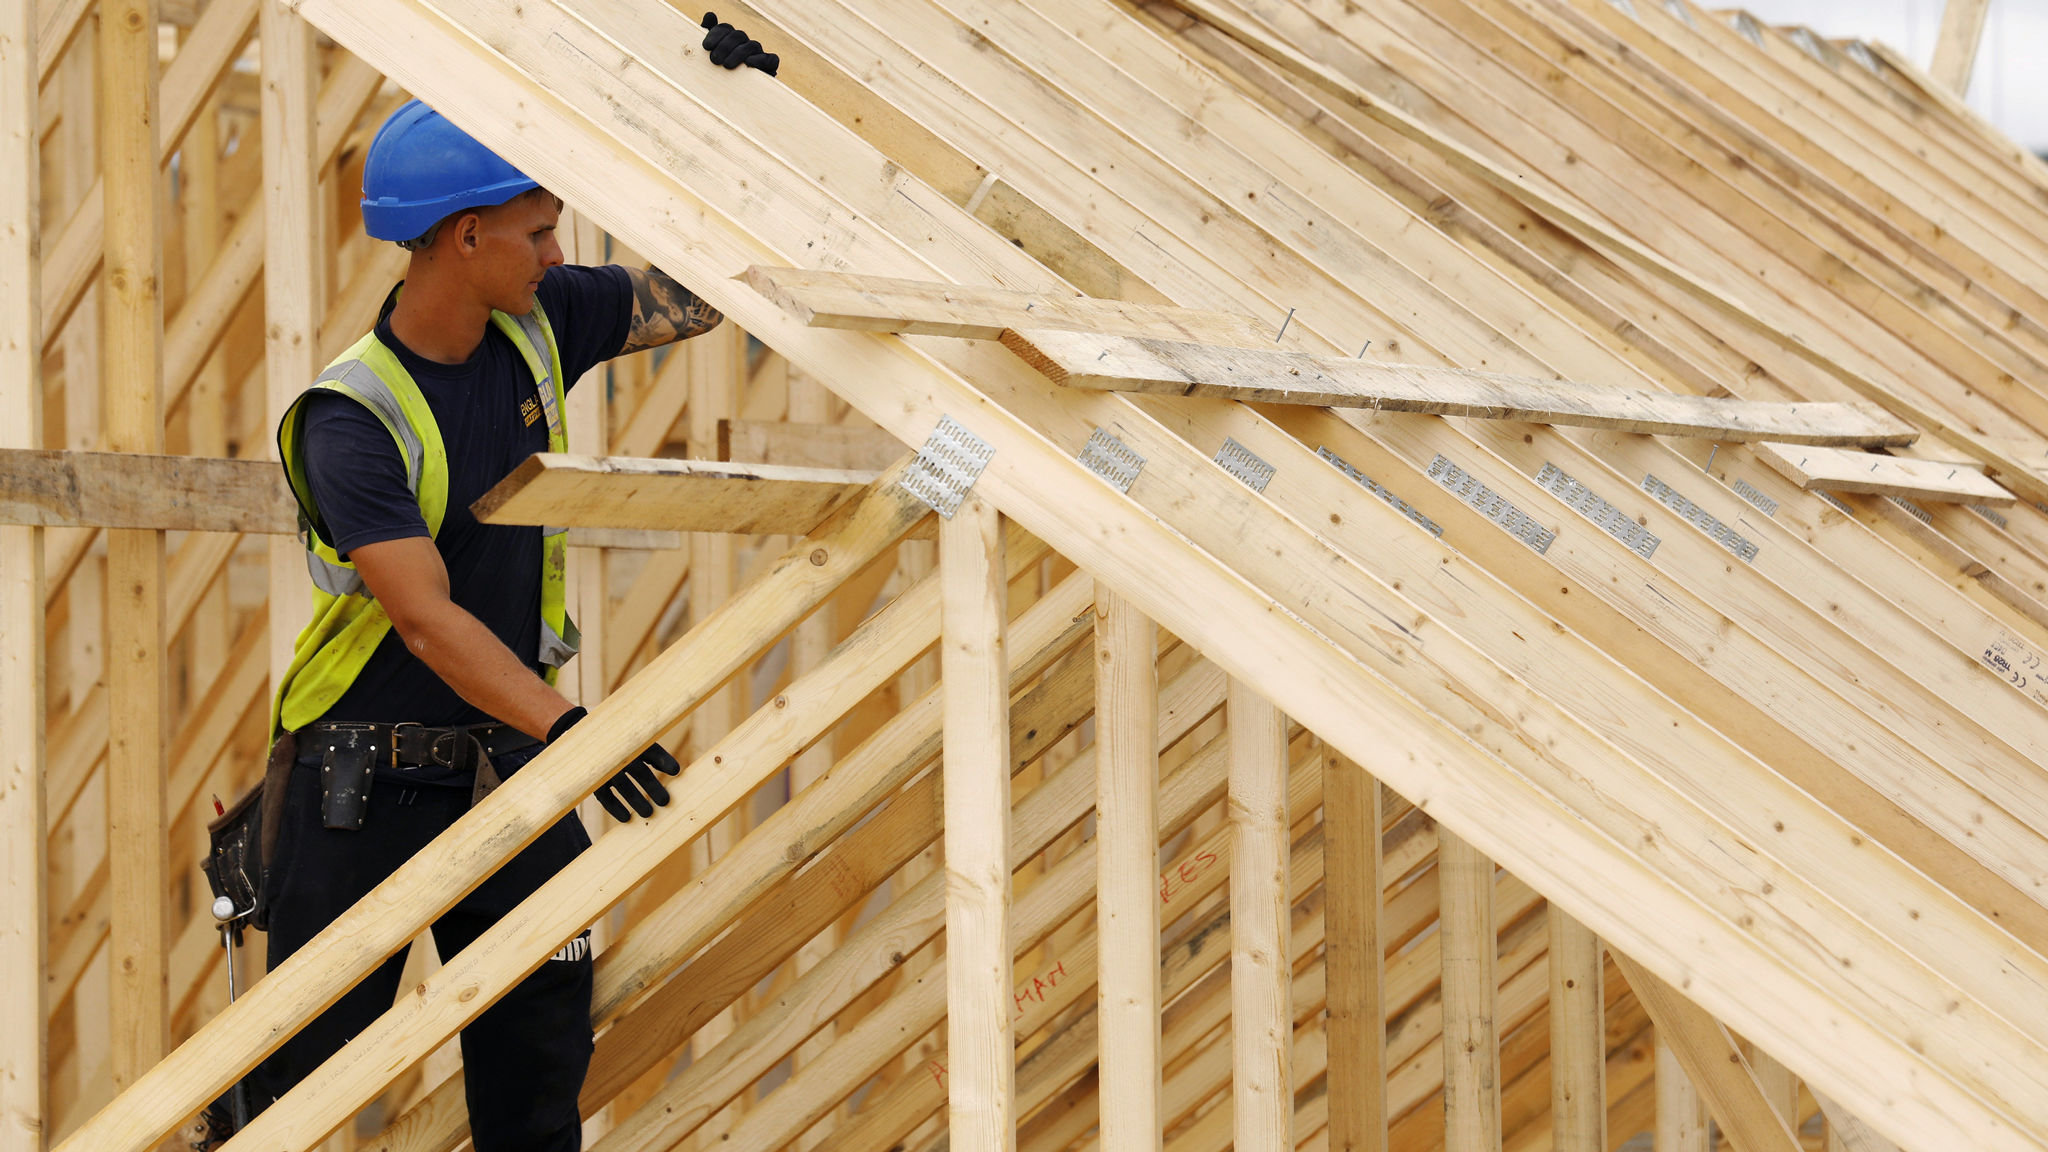 Key London boroughs buck trend of slower house sales